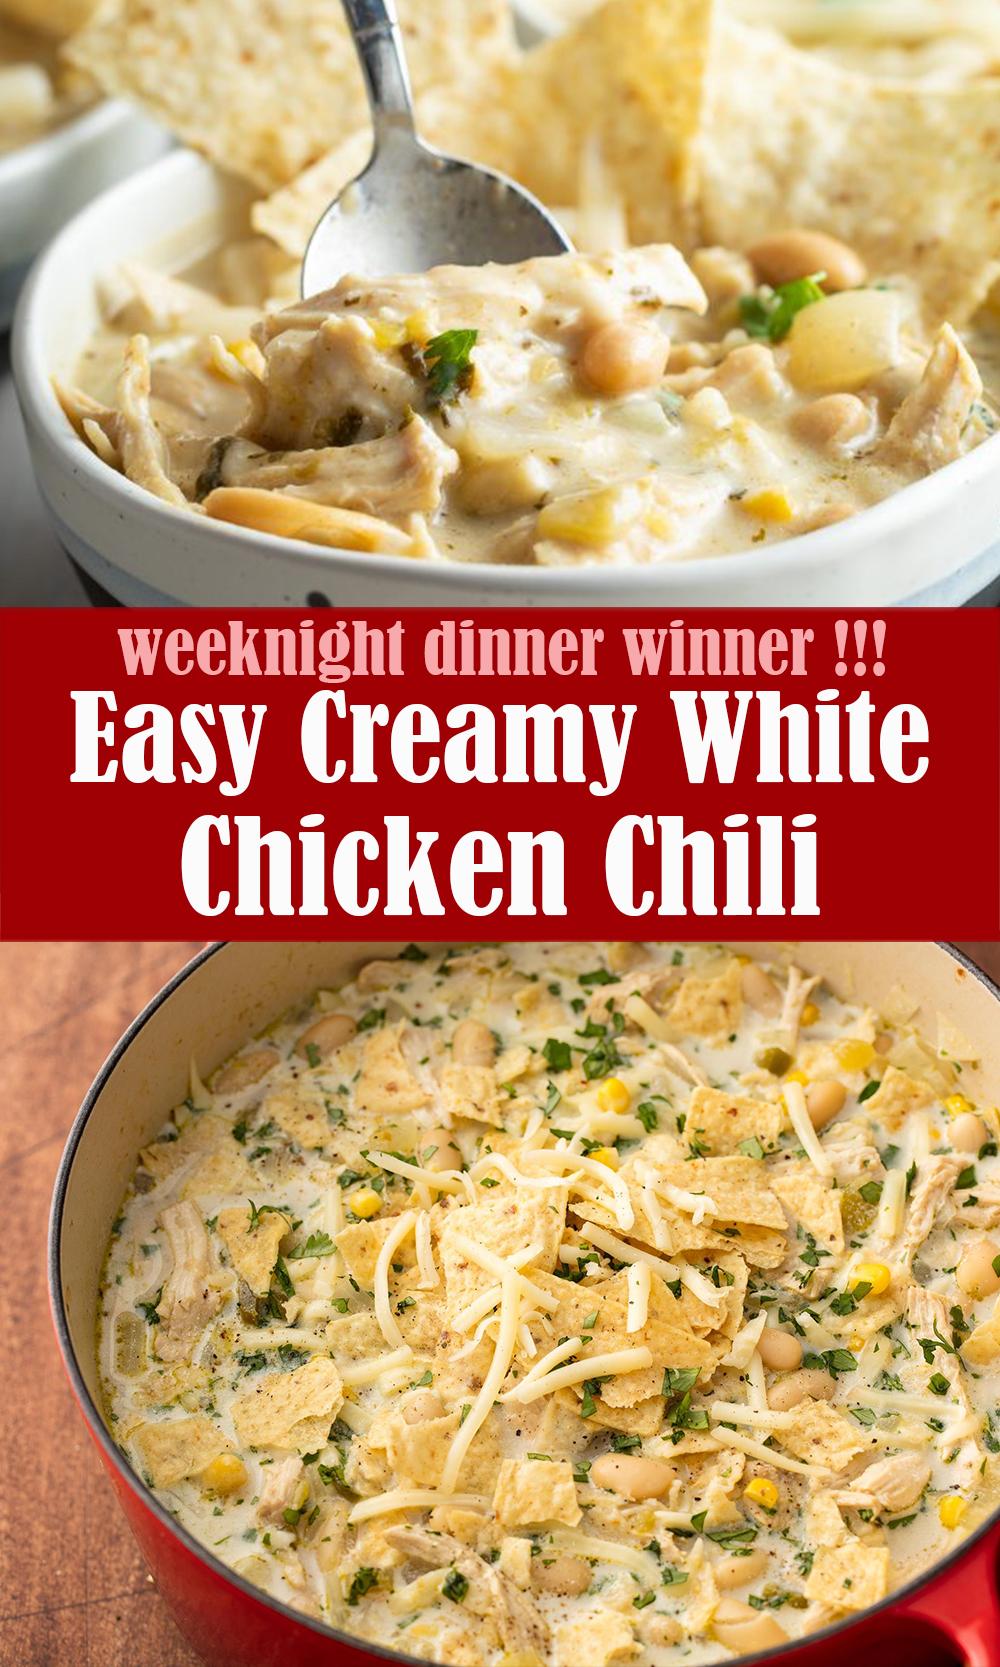 Easy Creamy White Chicken Chili